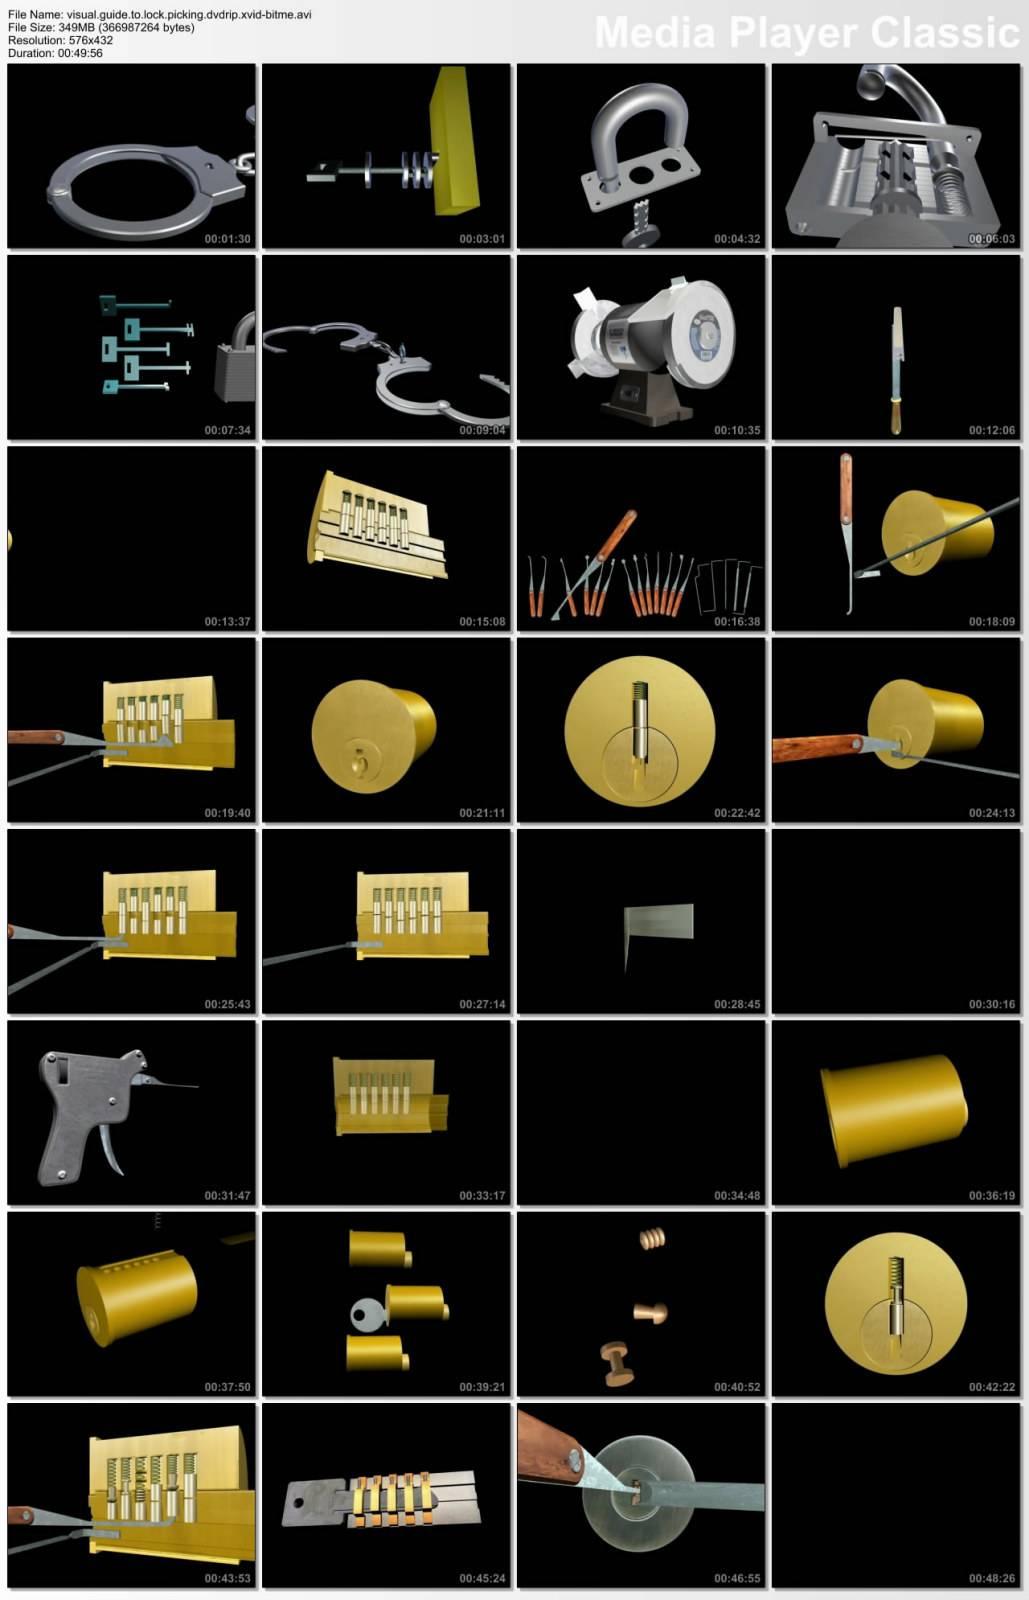 Visual Guide to Lock Picking